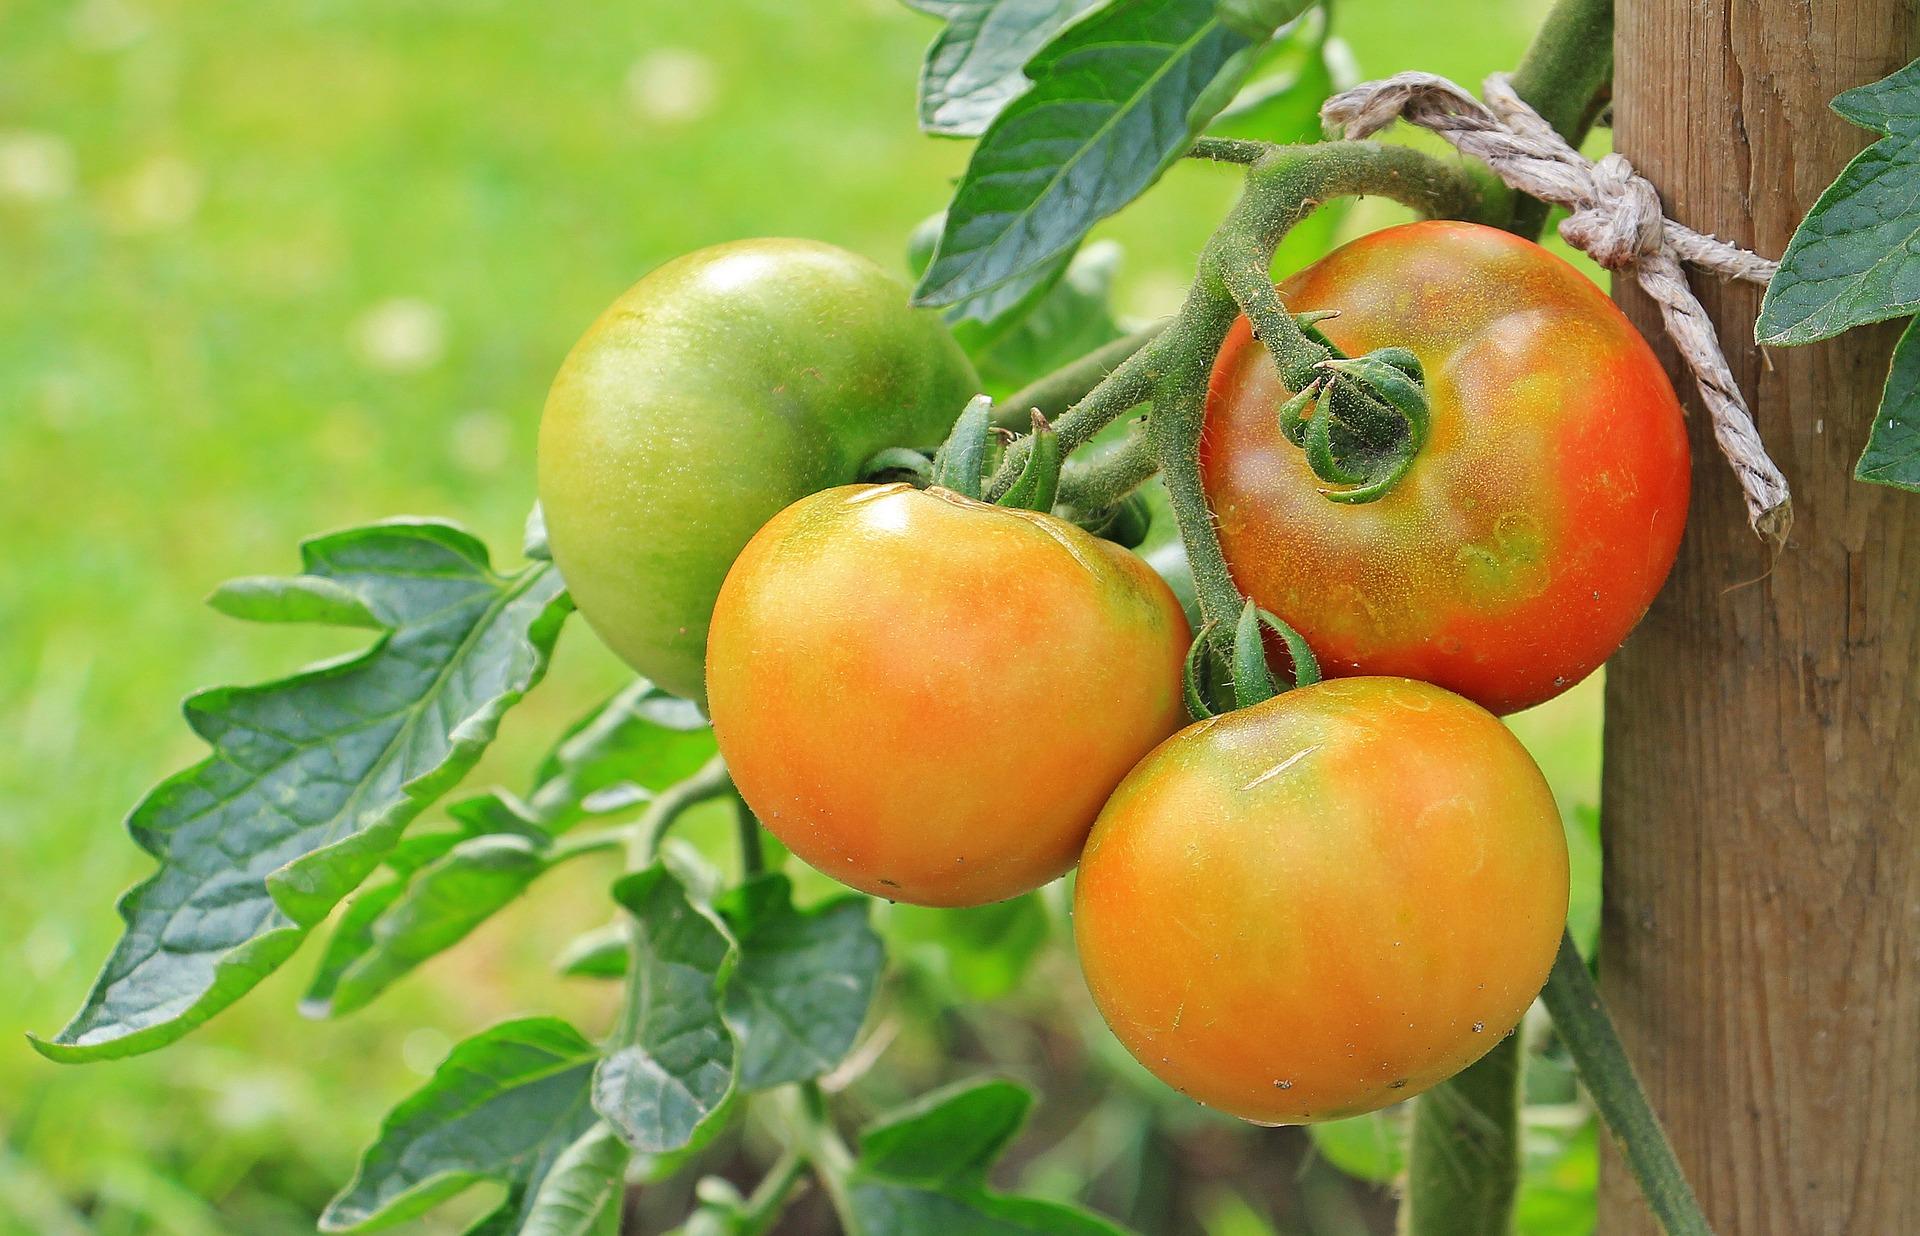 rajčica plod